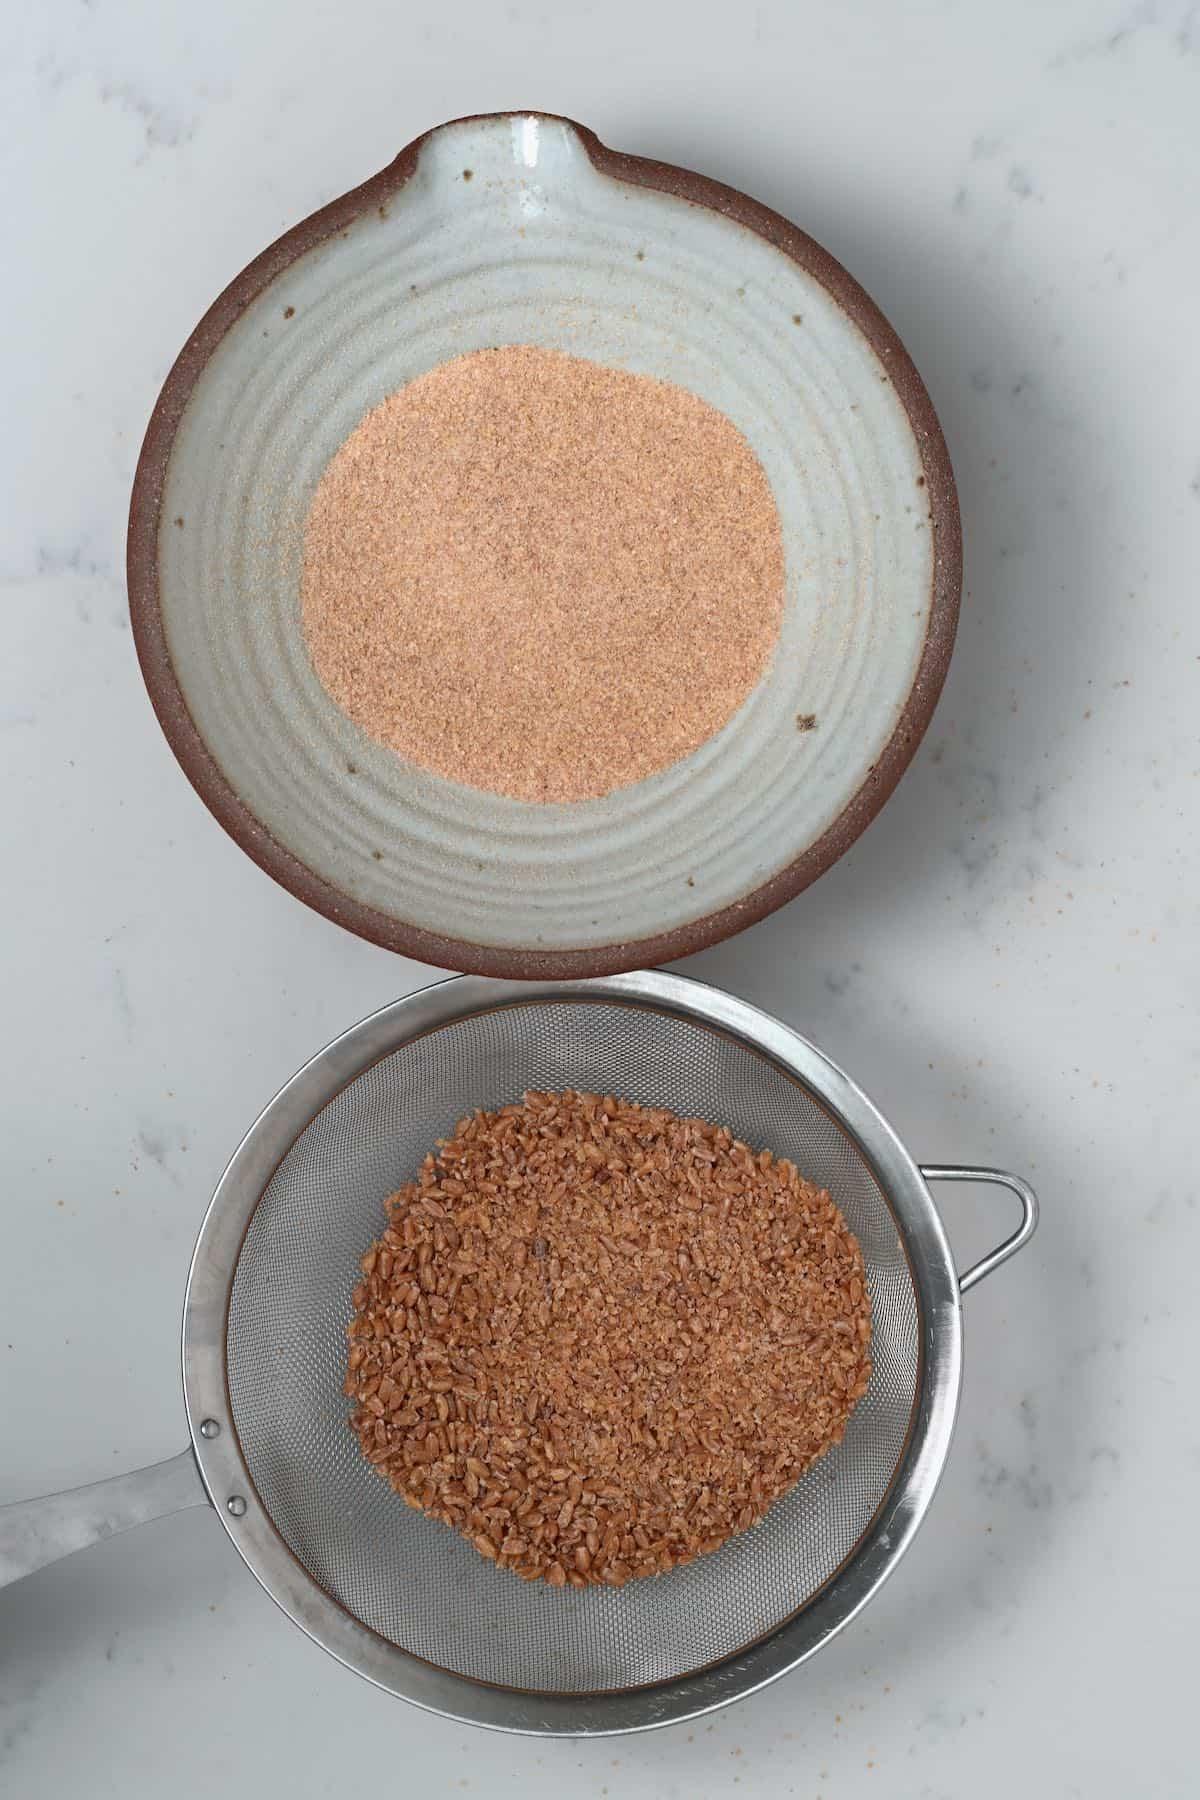 Sieving bulgur wheat